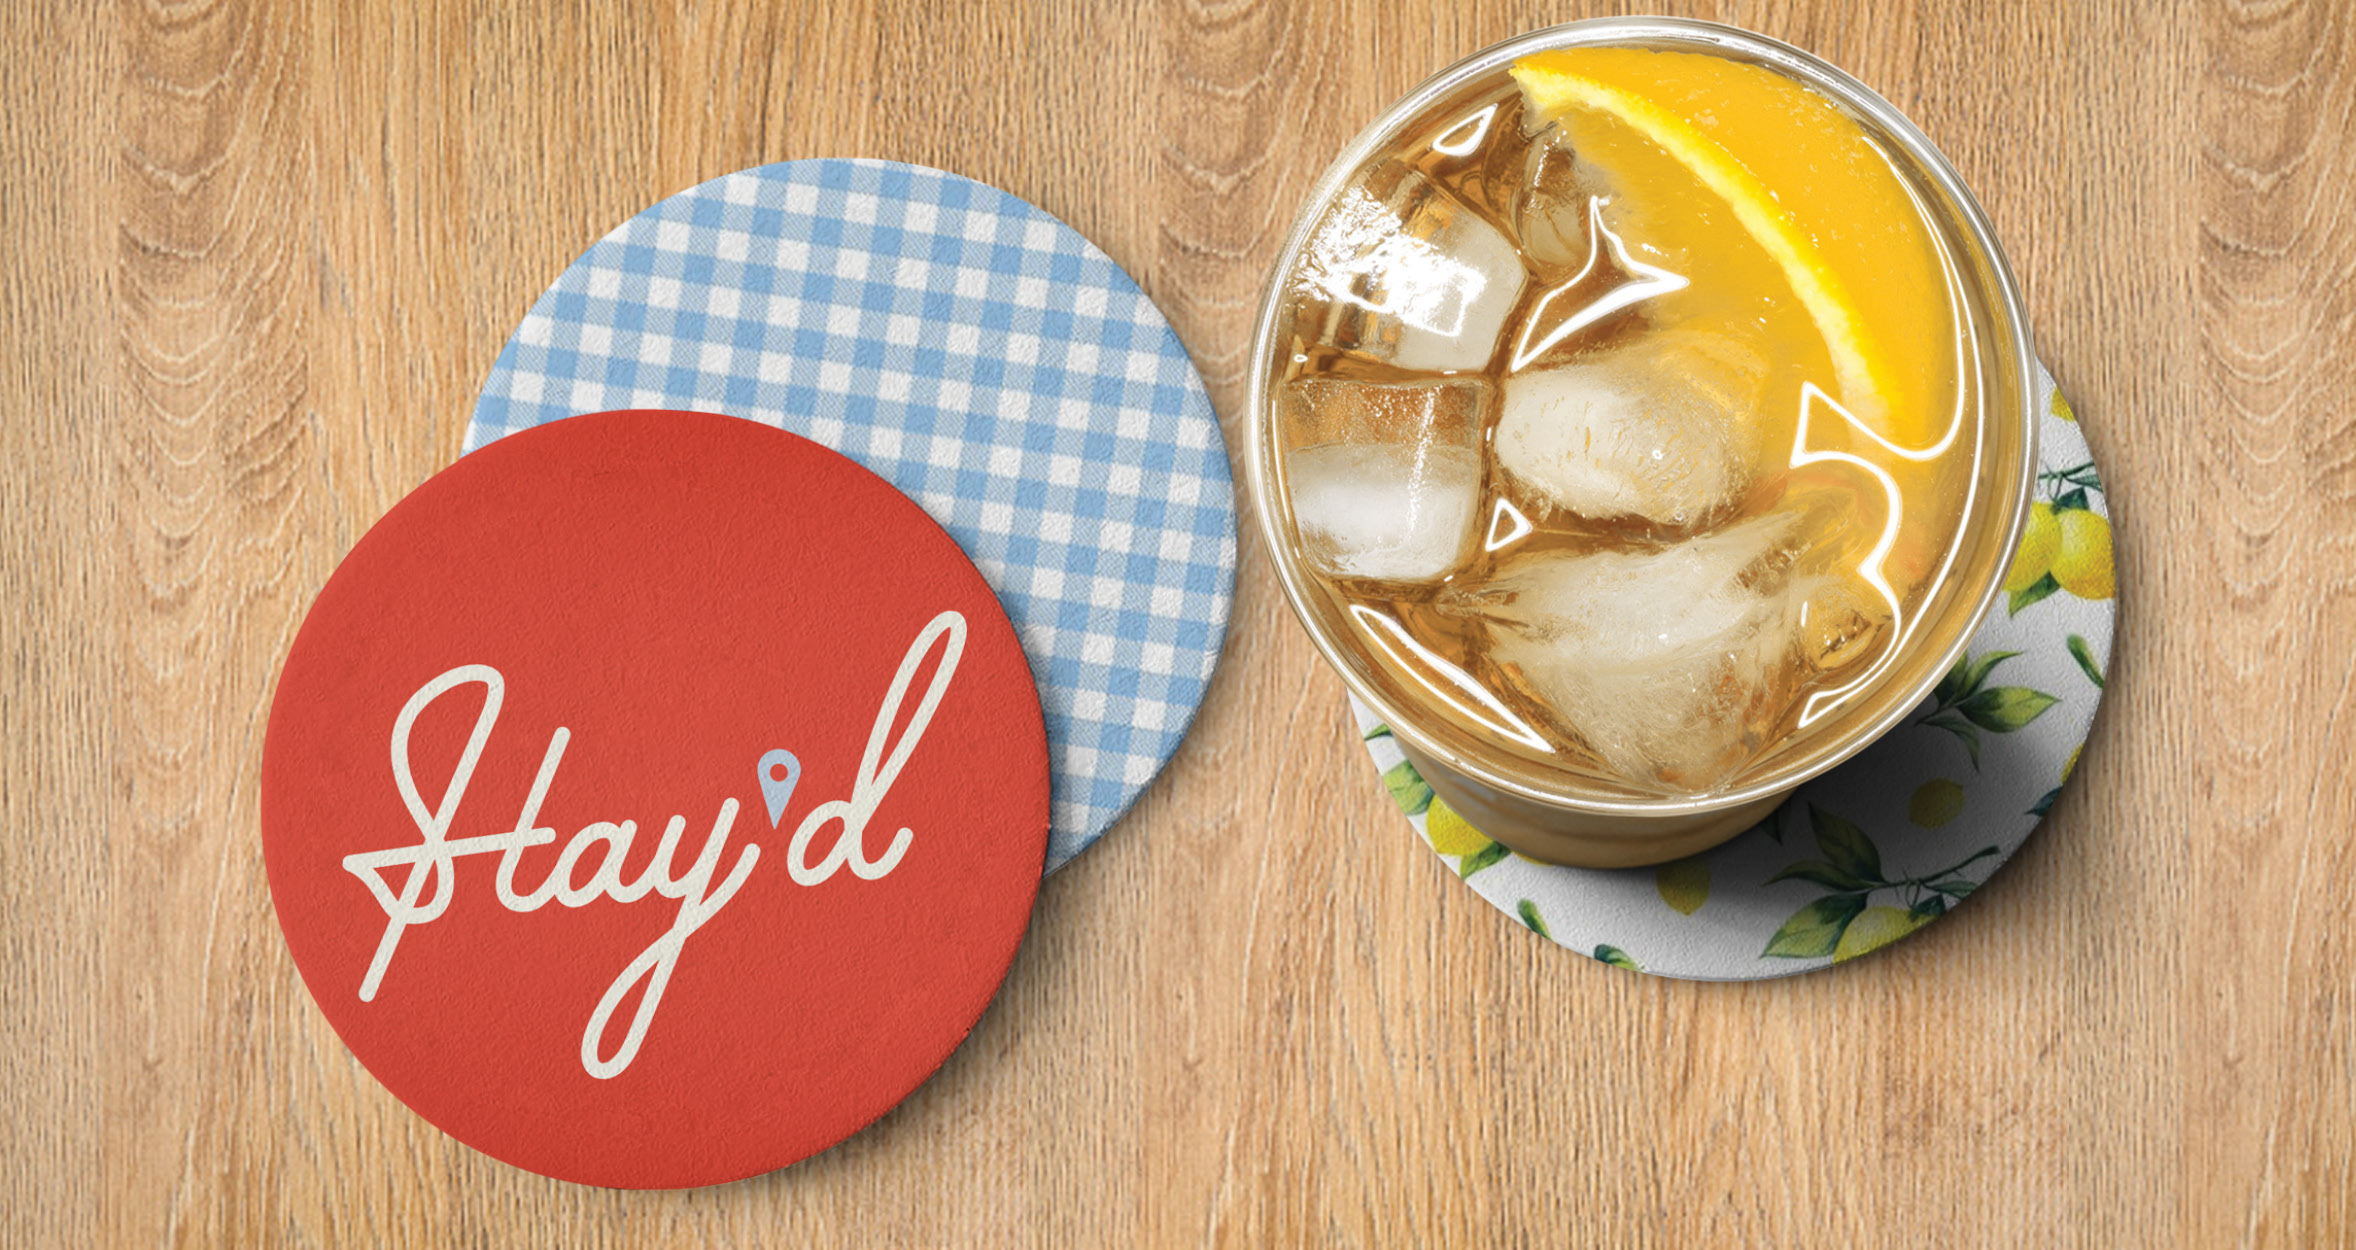 restaurant brand design